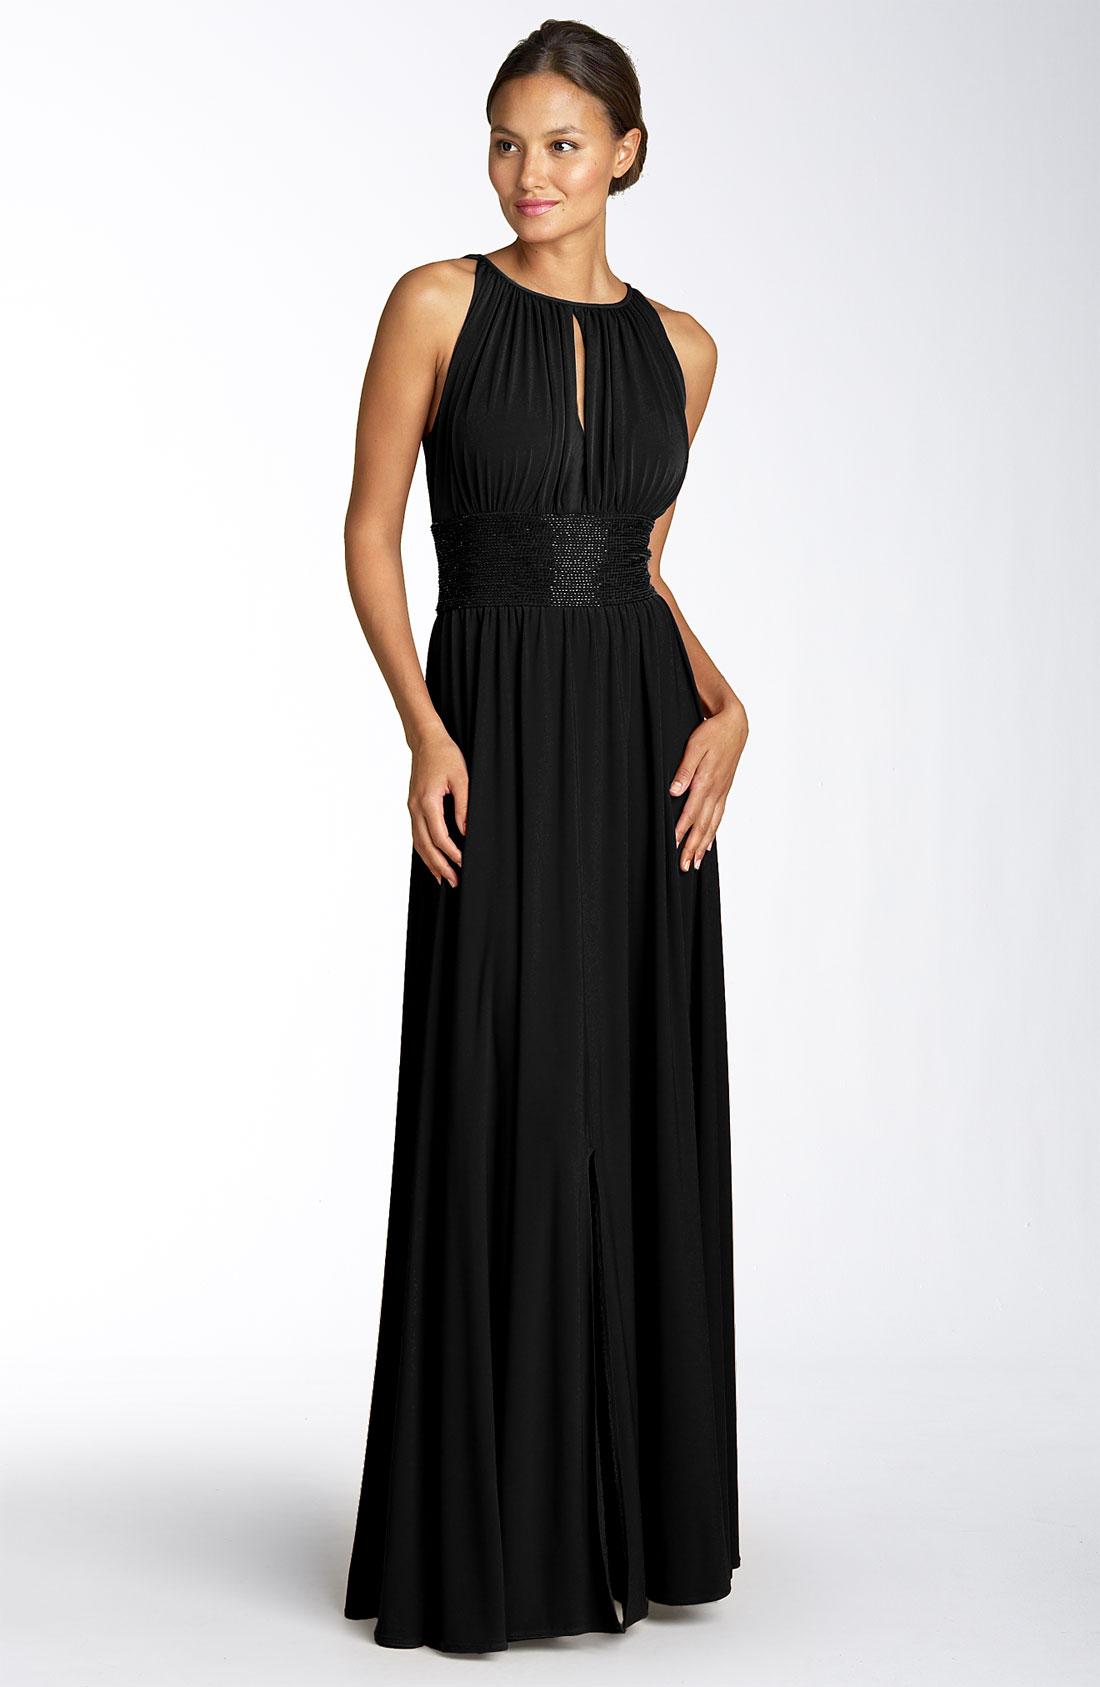 вечернее платье в стиле гэтсби фото